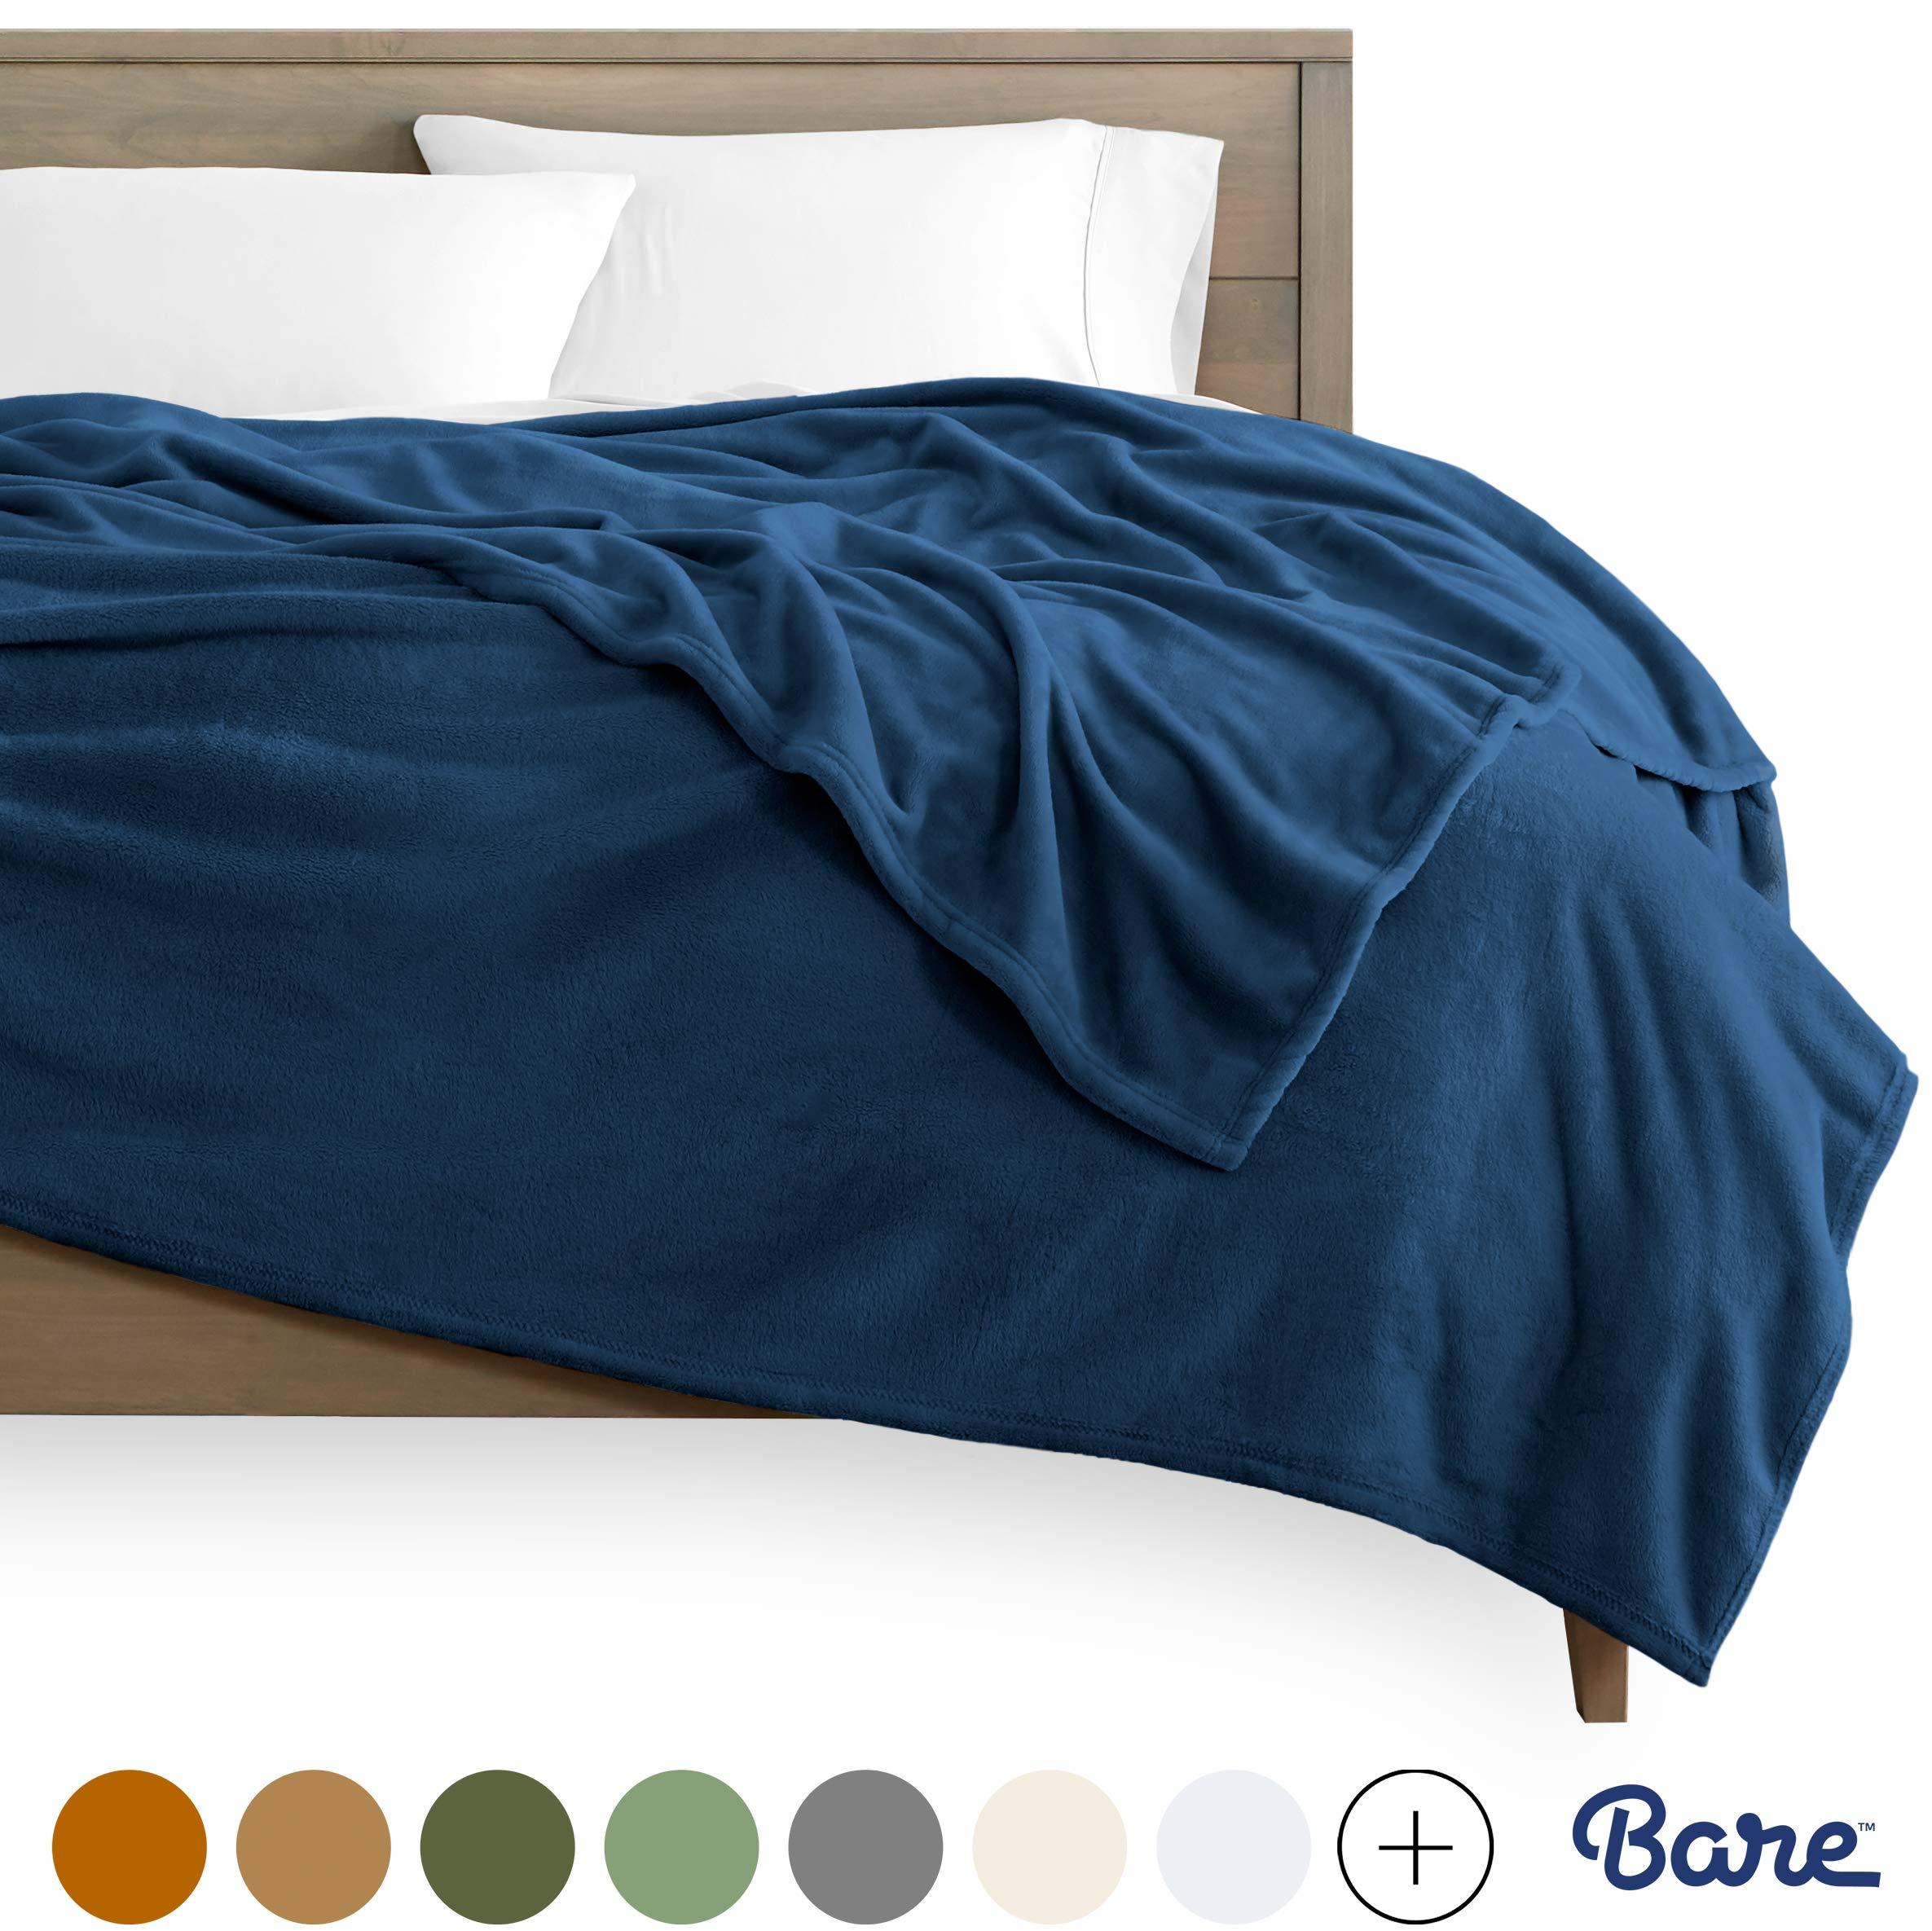 Bare Home Kids Microplush Fleece Blanket - Throw/Travel - Ultra-Soft Velvet - Luxurious Fuzzy Fleece Fur - Cozy Lightweight - Easy Care - All Season Premium Bed Blanket (Throw/Travel, Dark Blue)